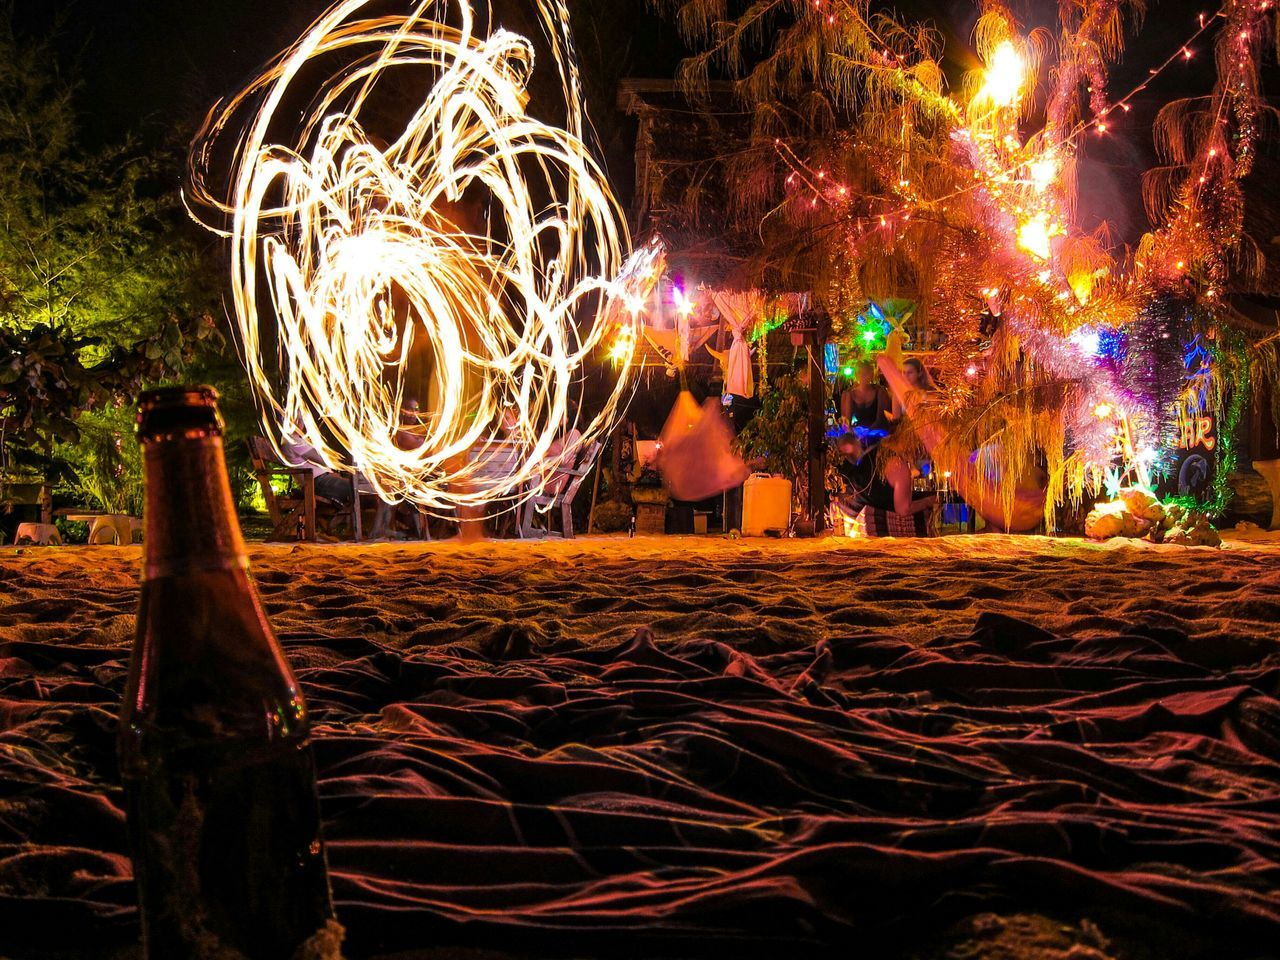 Poi Three Monkeys Bar EyeEm Koh Phangan Darkness And Light RePicture Travel Creative Light And Shadow